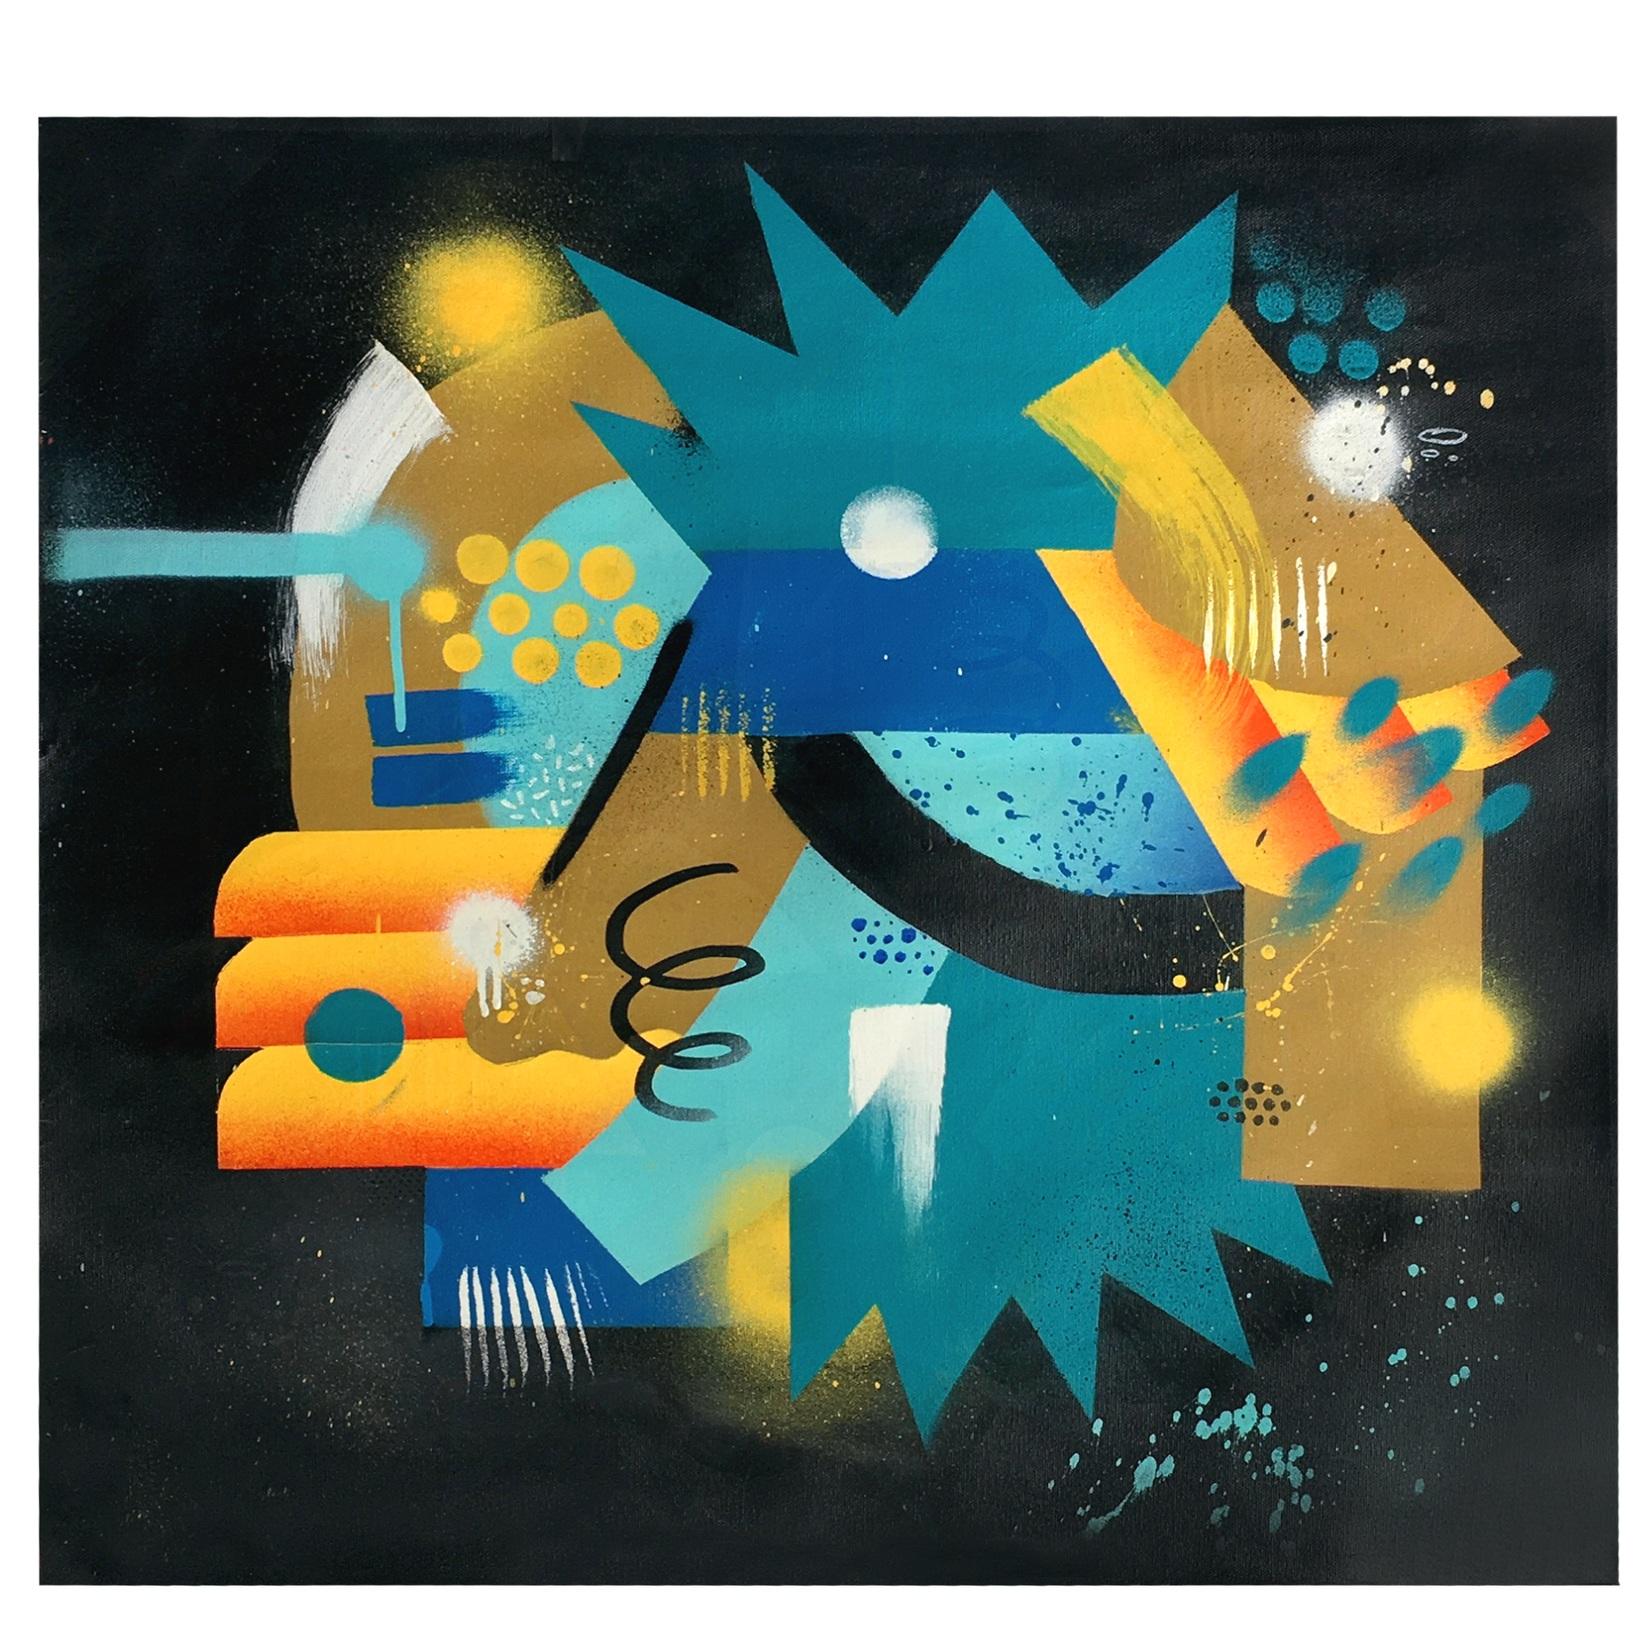 Sem Título, 2018  Tamanho: 50 x 70 cm  Técnica: Spray, tinta acrílica, marcador, sobre canvas.  R$ 350,00